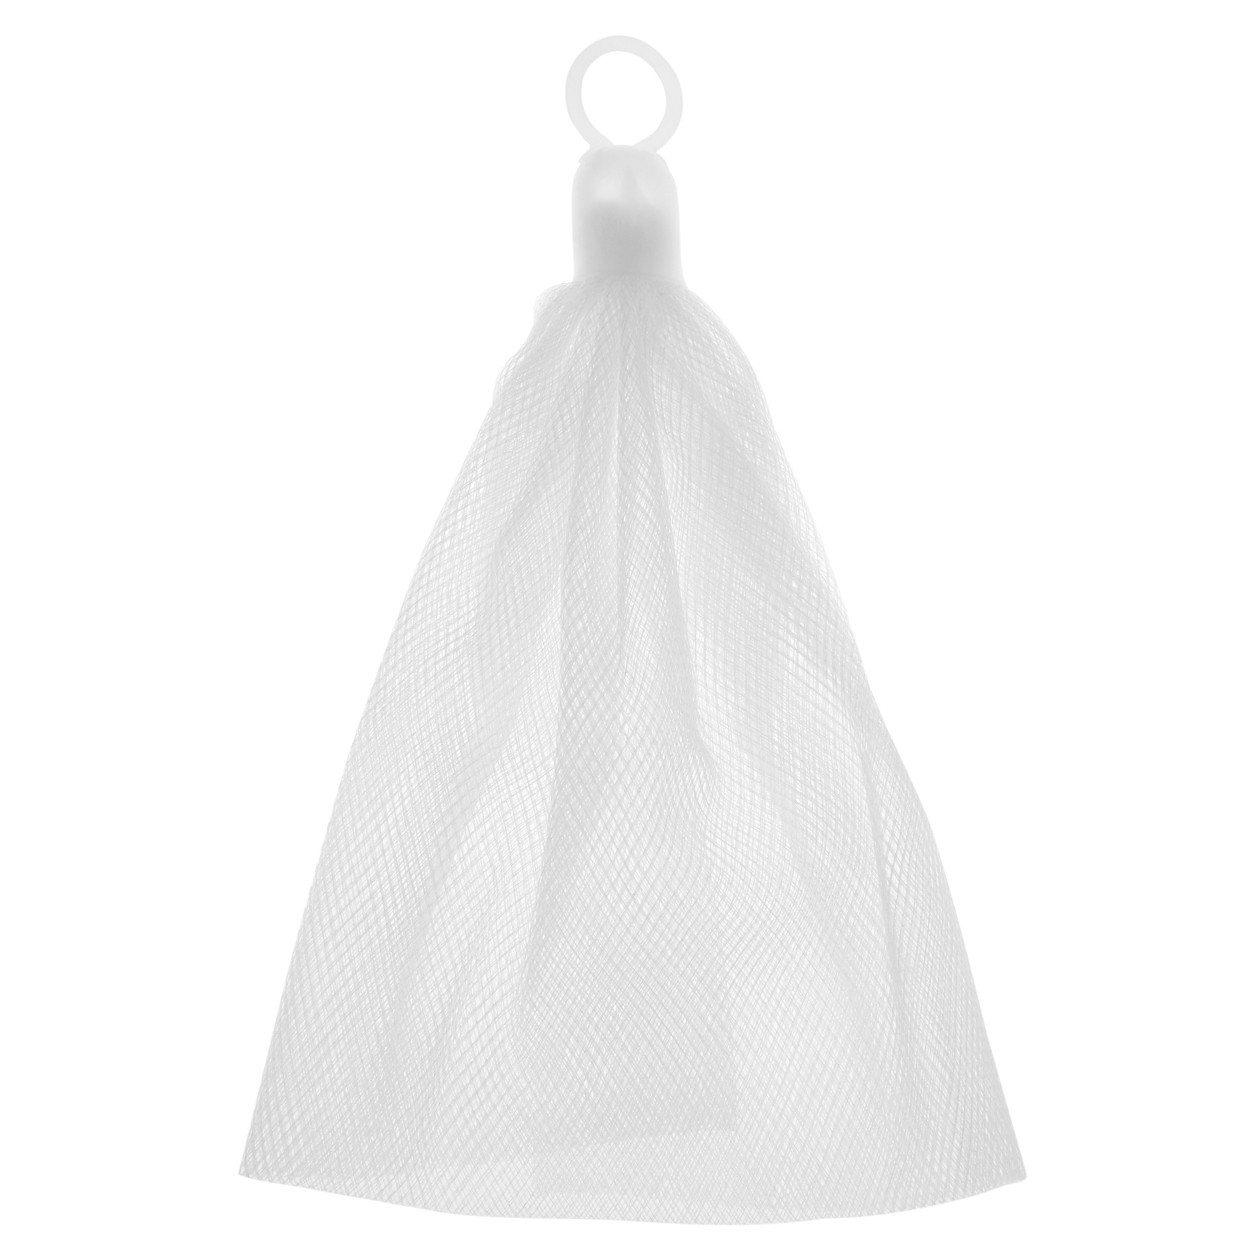 MUJI無印良品洗臉用網狀起泡網,從原價60元調降為39元。圖/無印良品提供